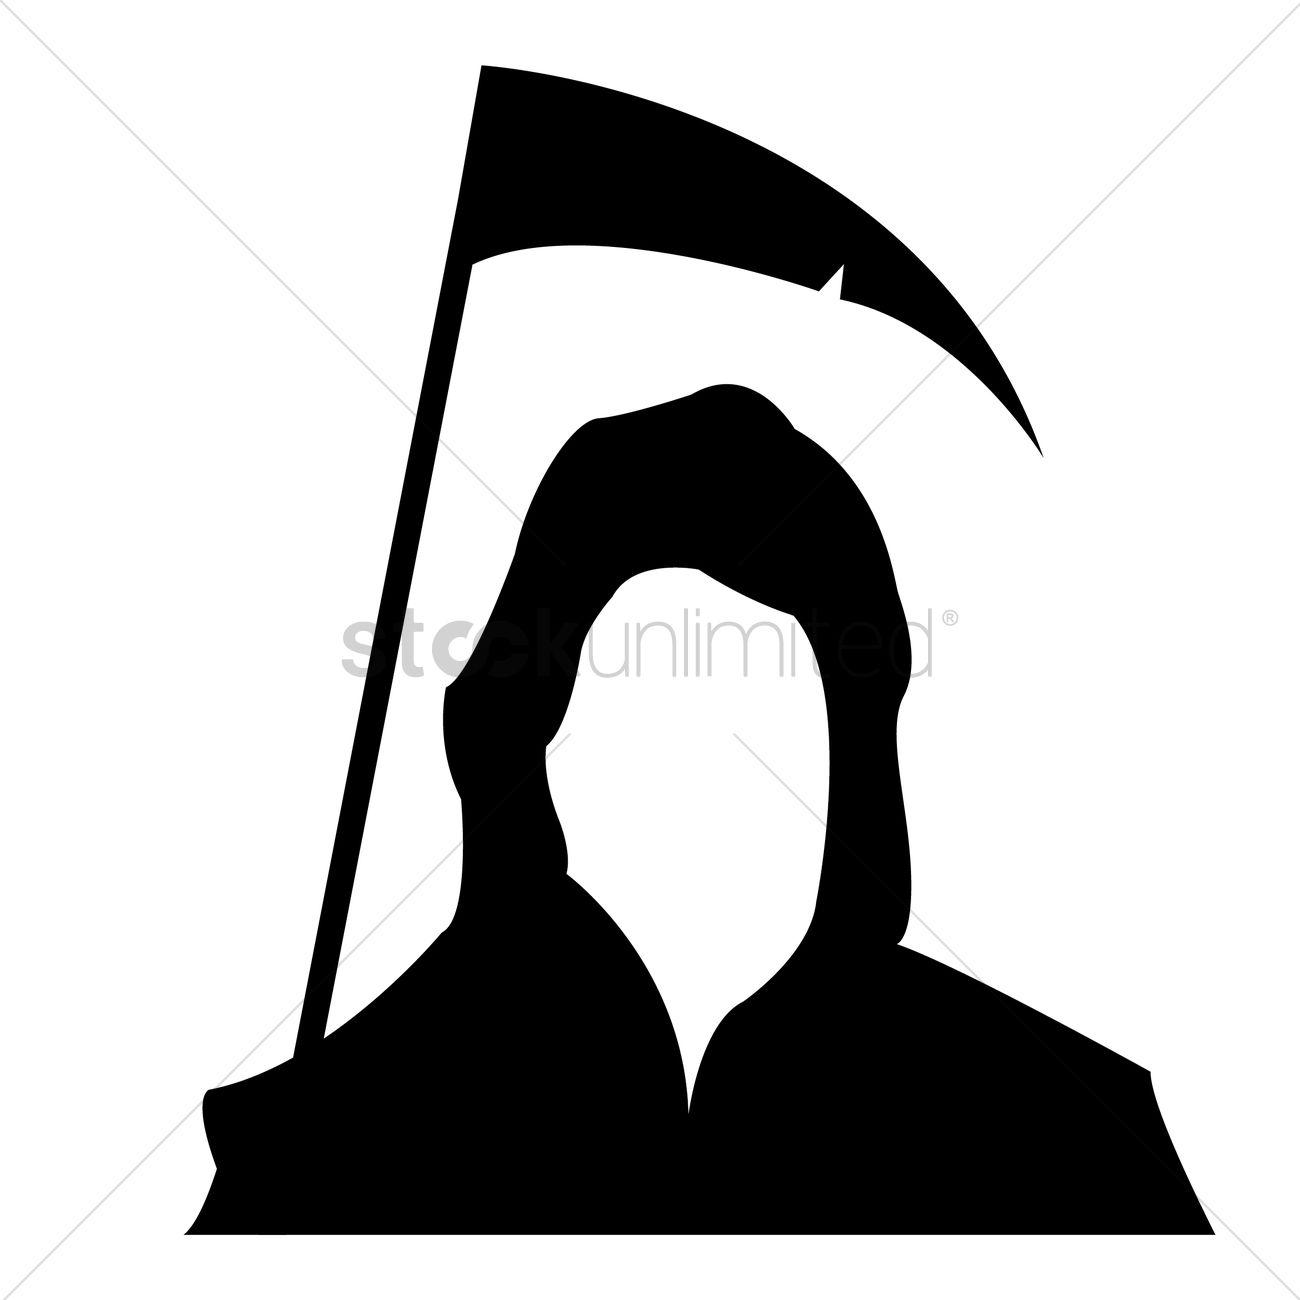 grim reaper silhouette vector image 1483320 stockunlimited rh stockunlimited com